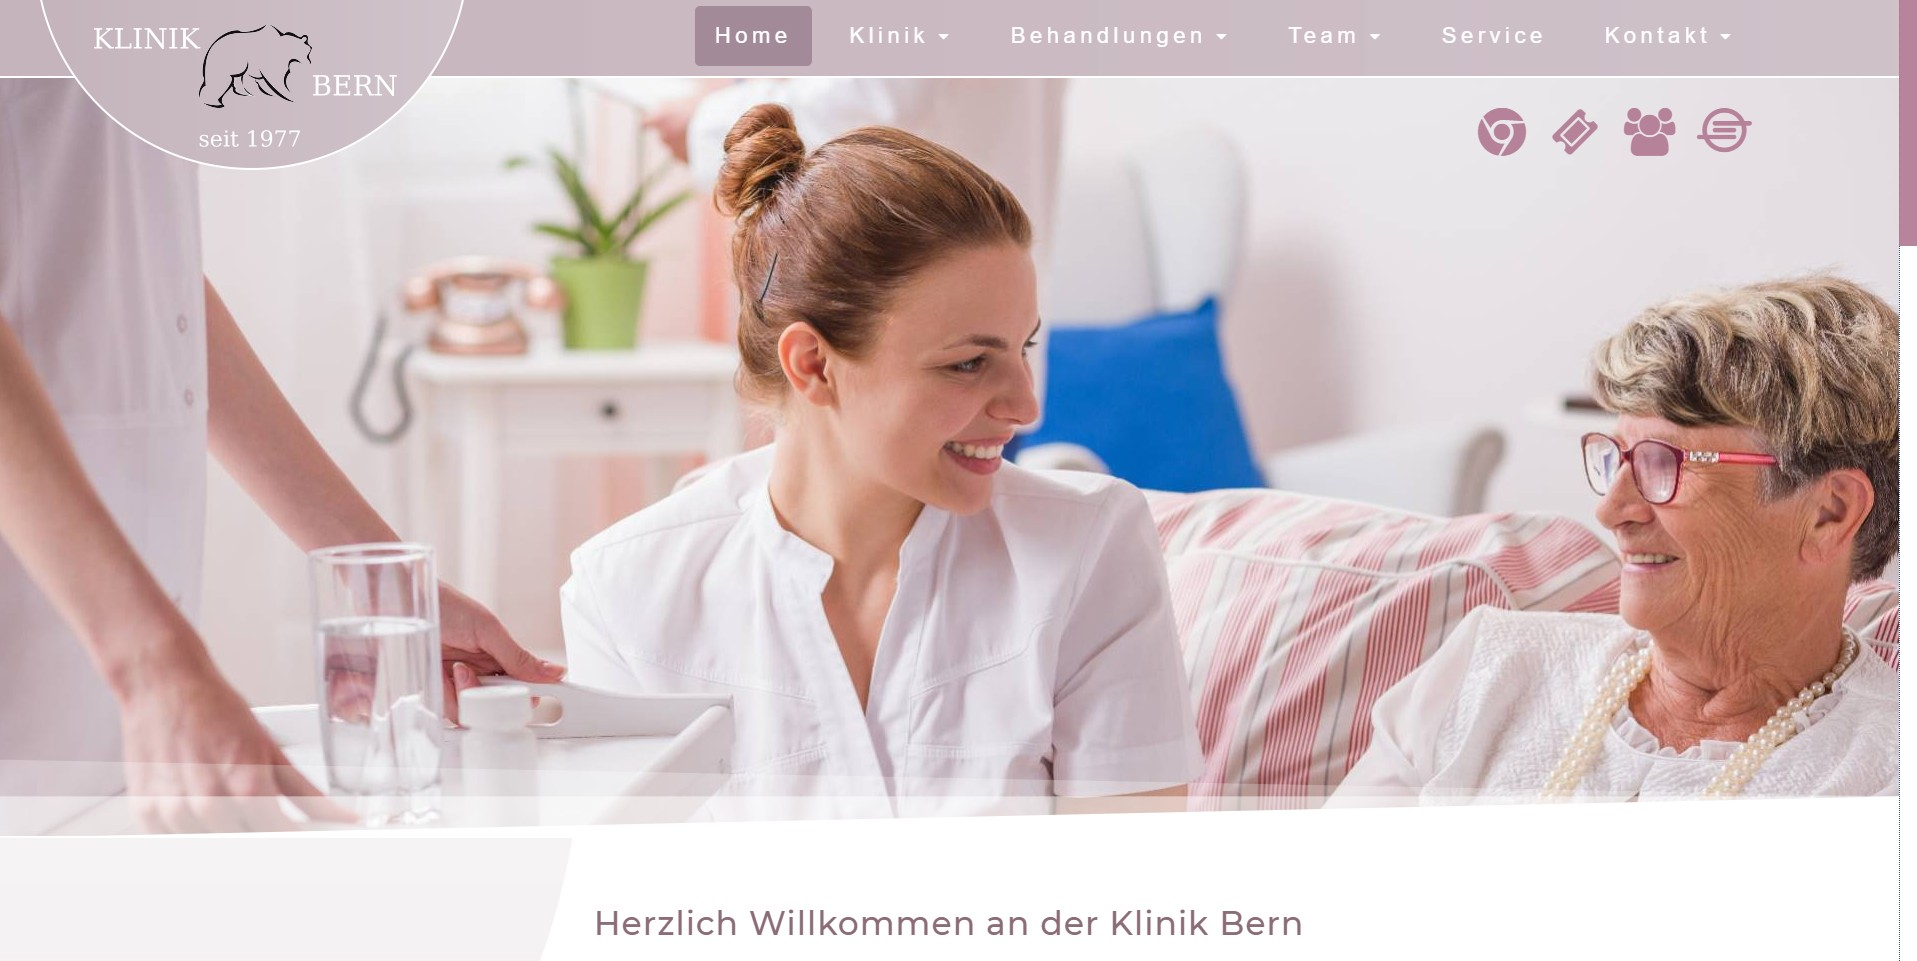 Klinik-Bern.ch